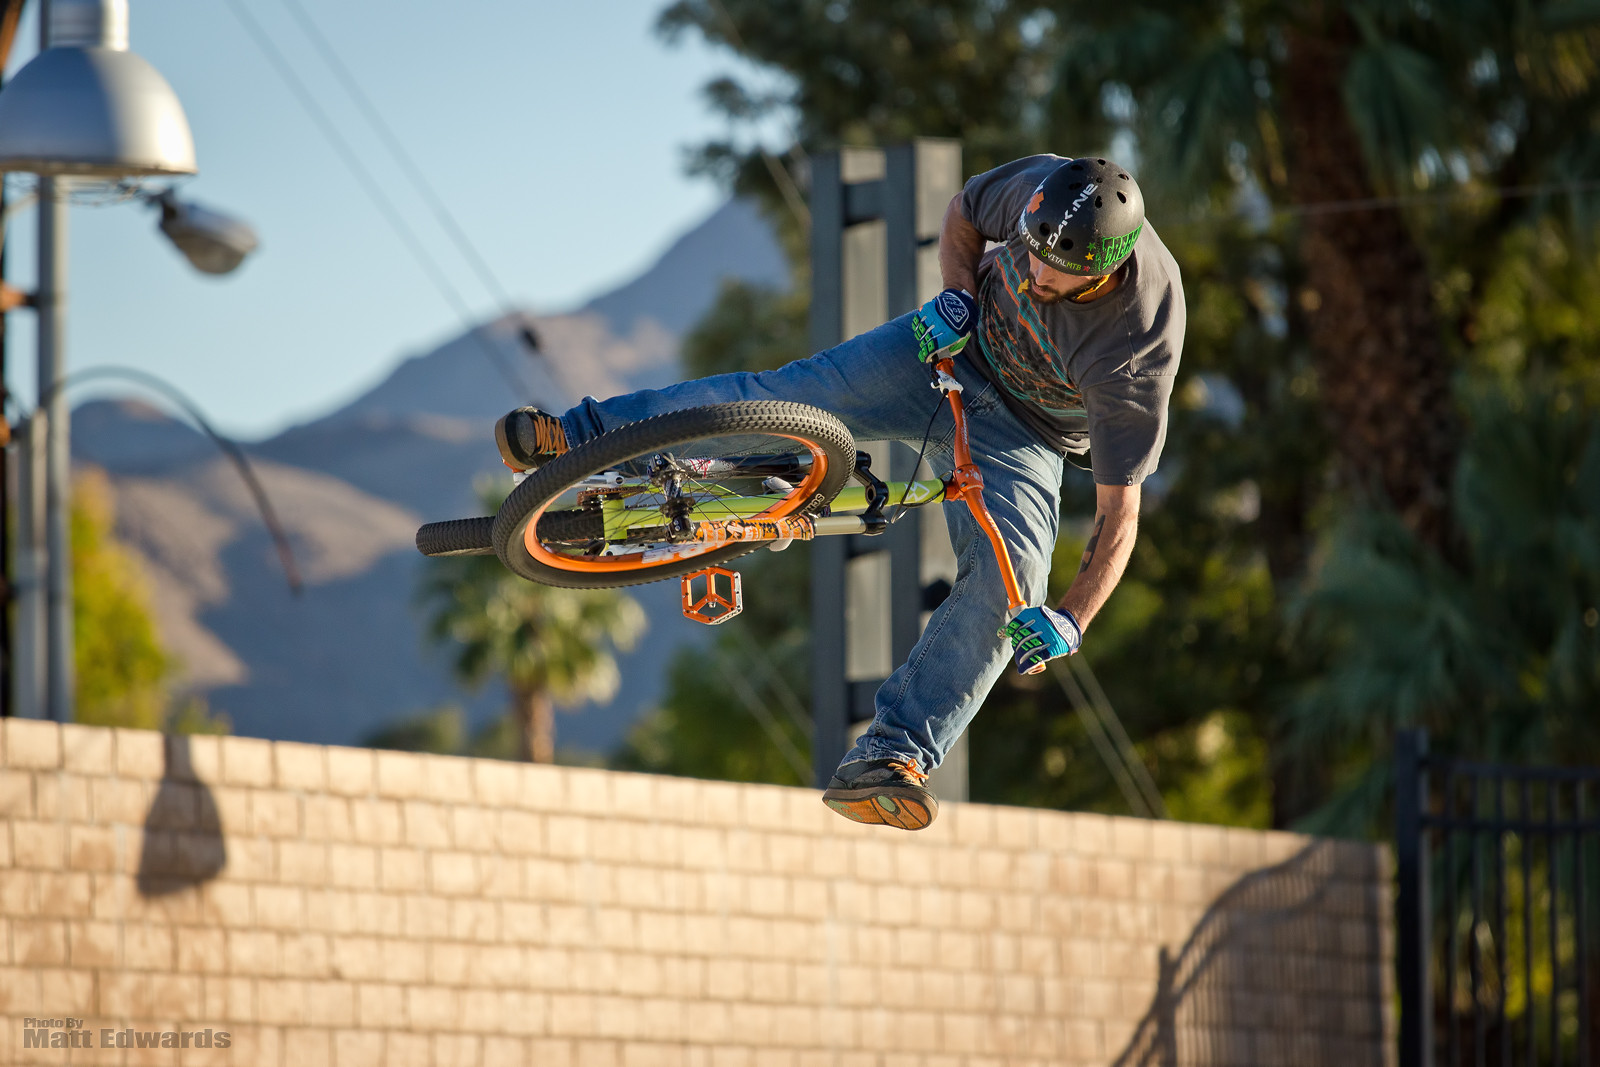 Flat 1 footer - EdwardsEntertainment - Mountain Biking Pictures - Vital MTB